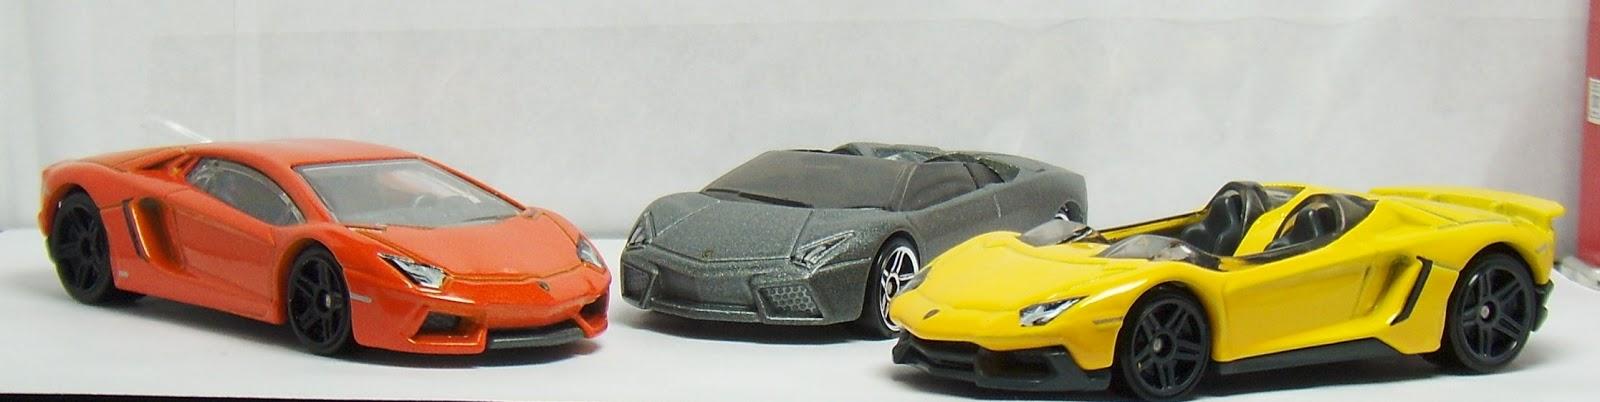 Hot Wheels Lamborghini Aventador Coupe J Concept And Reventon